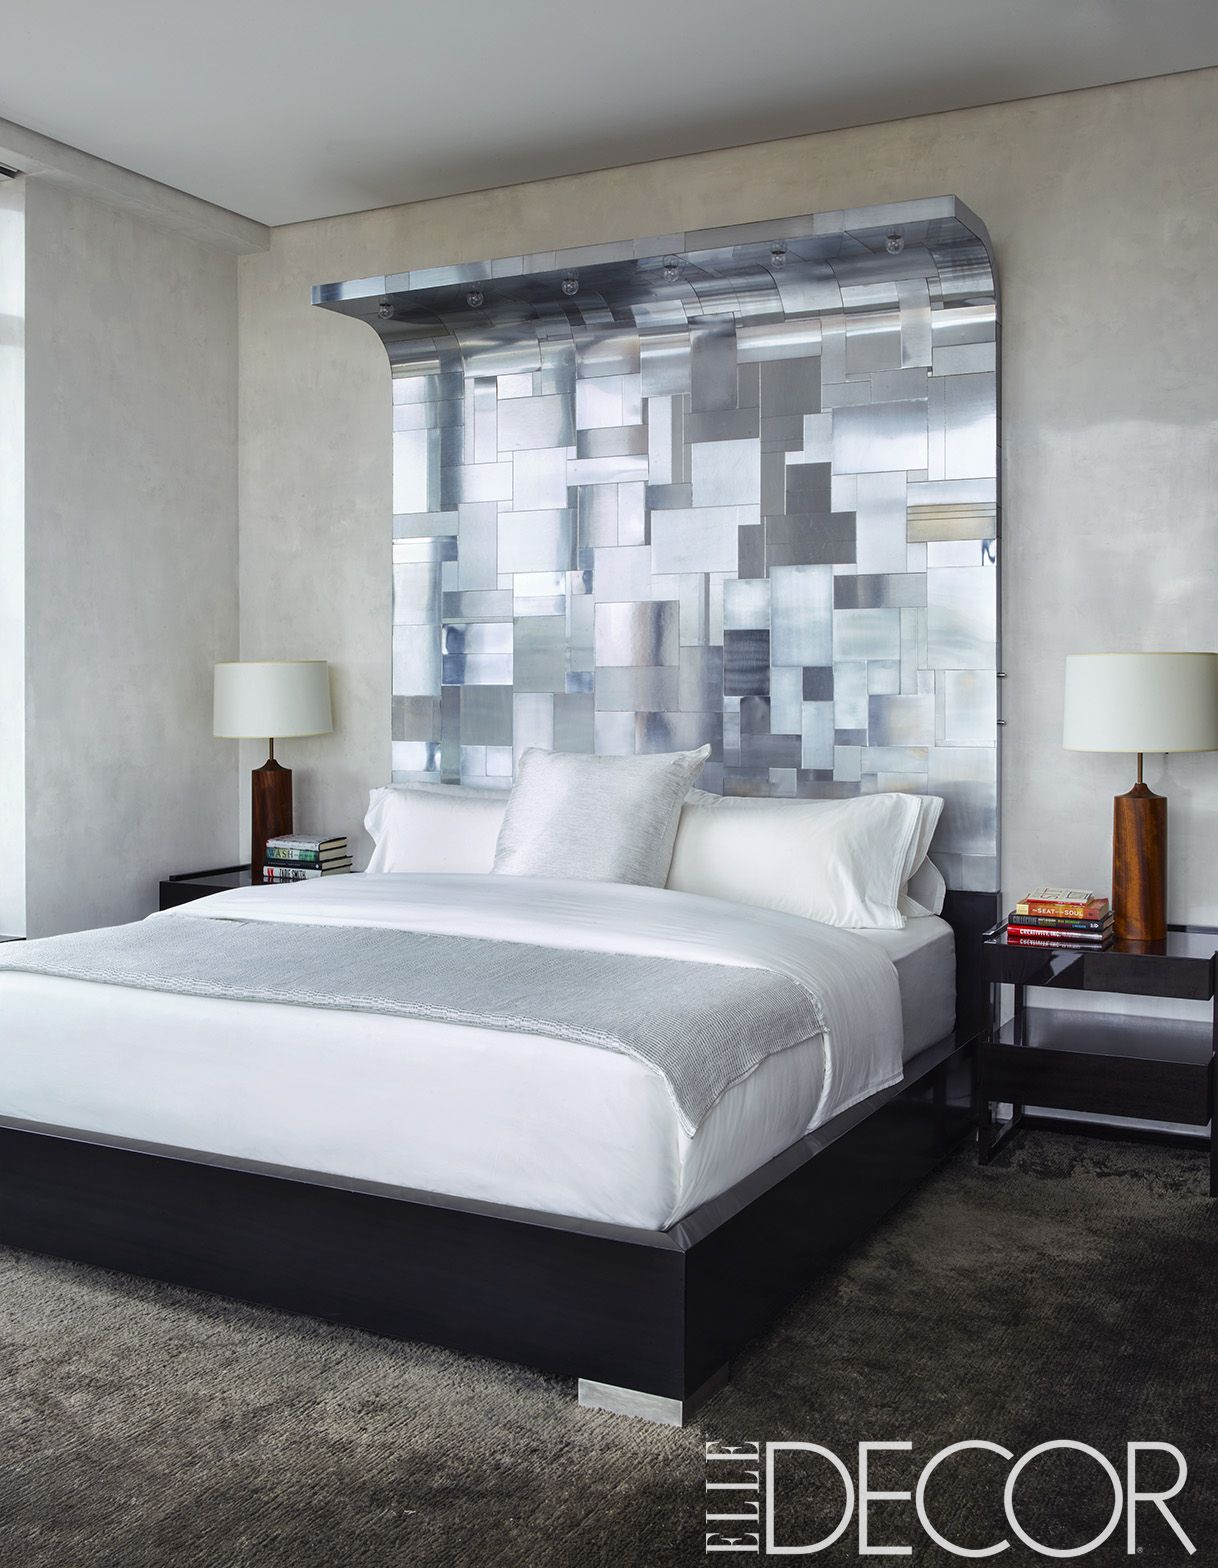 25 Minimalist Bedroom Decor Ideas - Modern Designs for ... on Bedroom Minimalist Design Ideas  id=80611